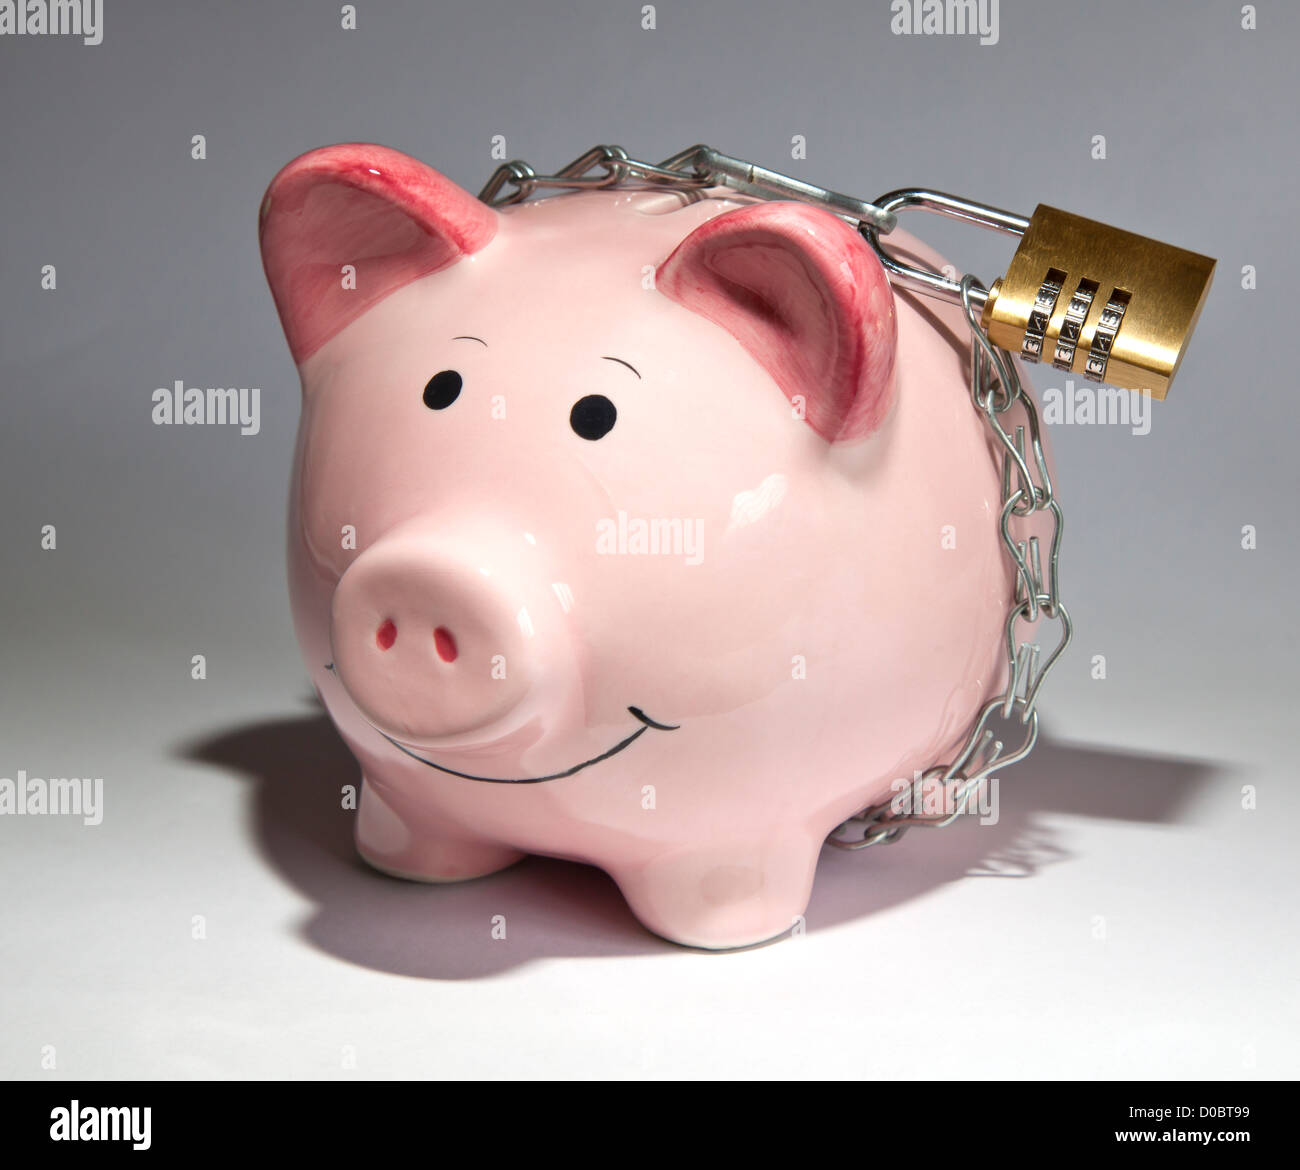 Piggy bank savings locked up Stock Photo